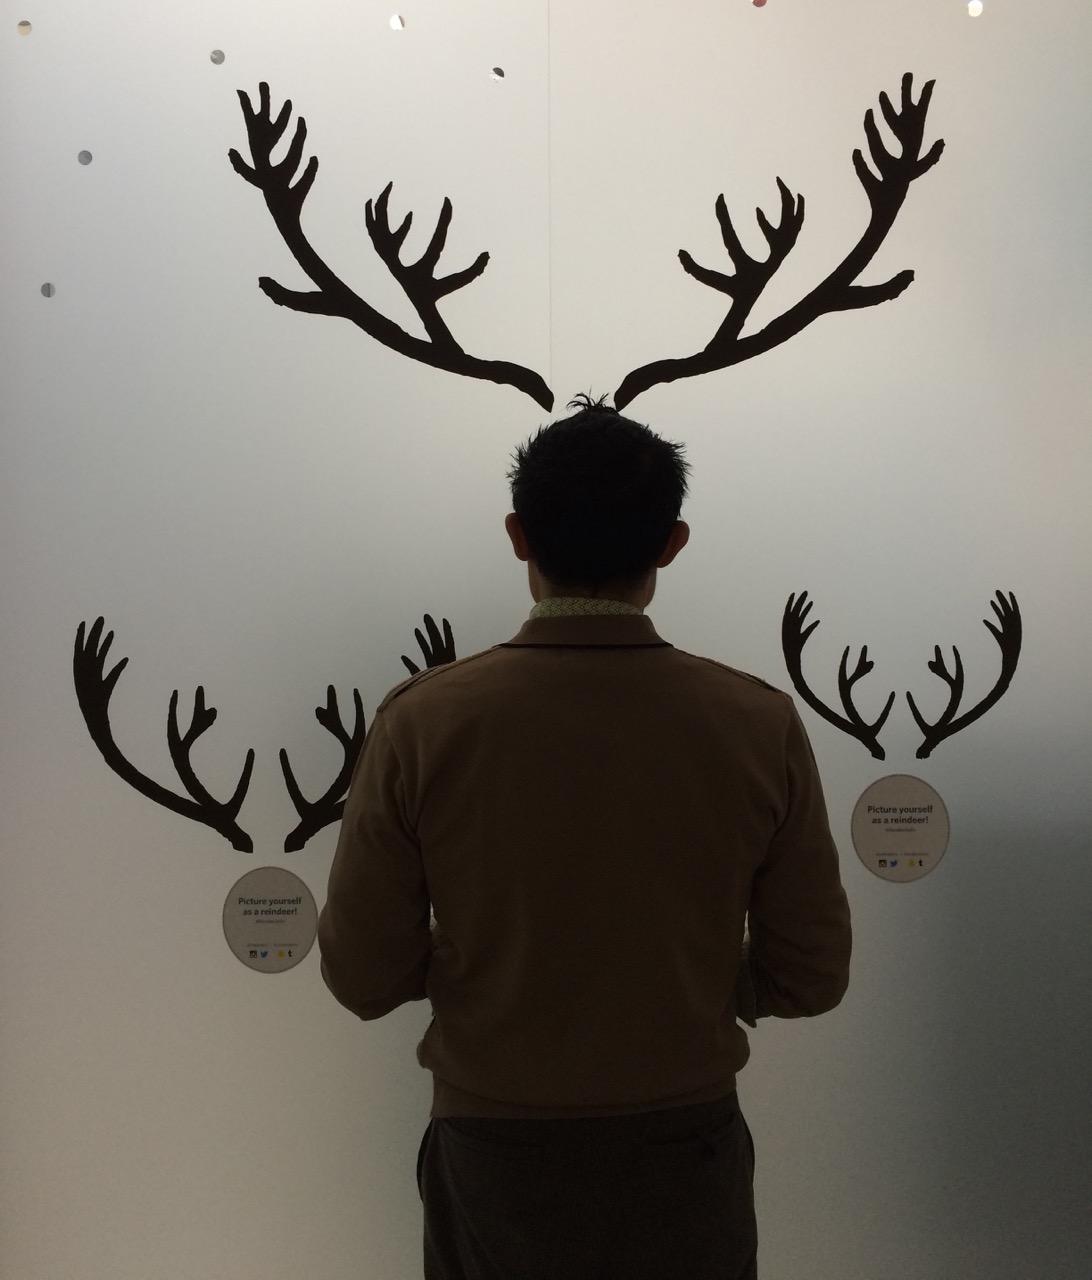 Reindeerselfie 2015